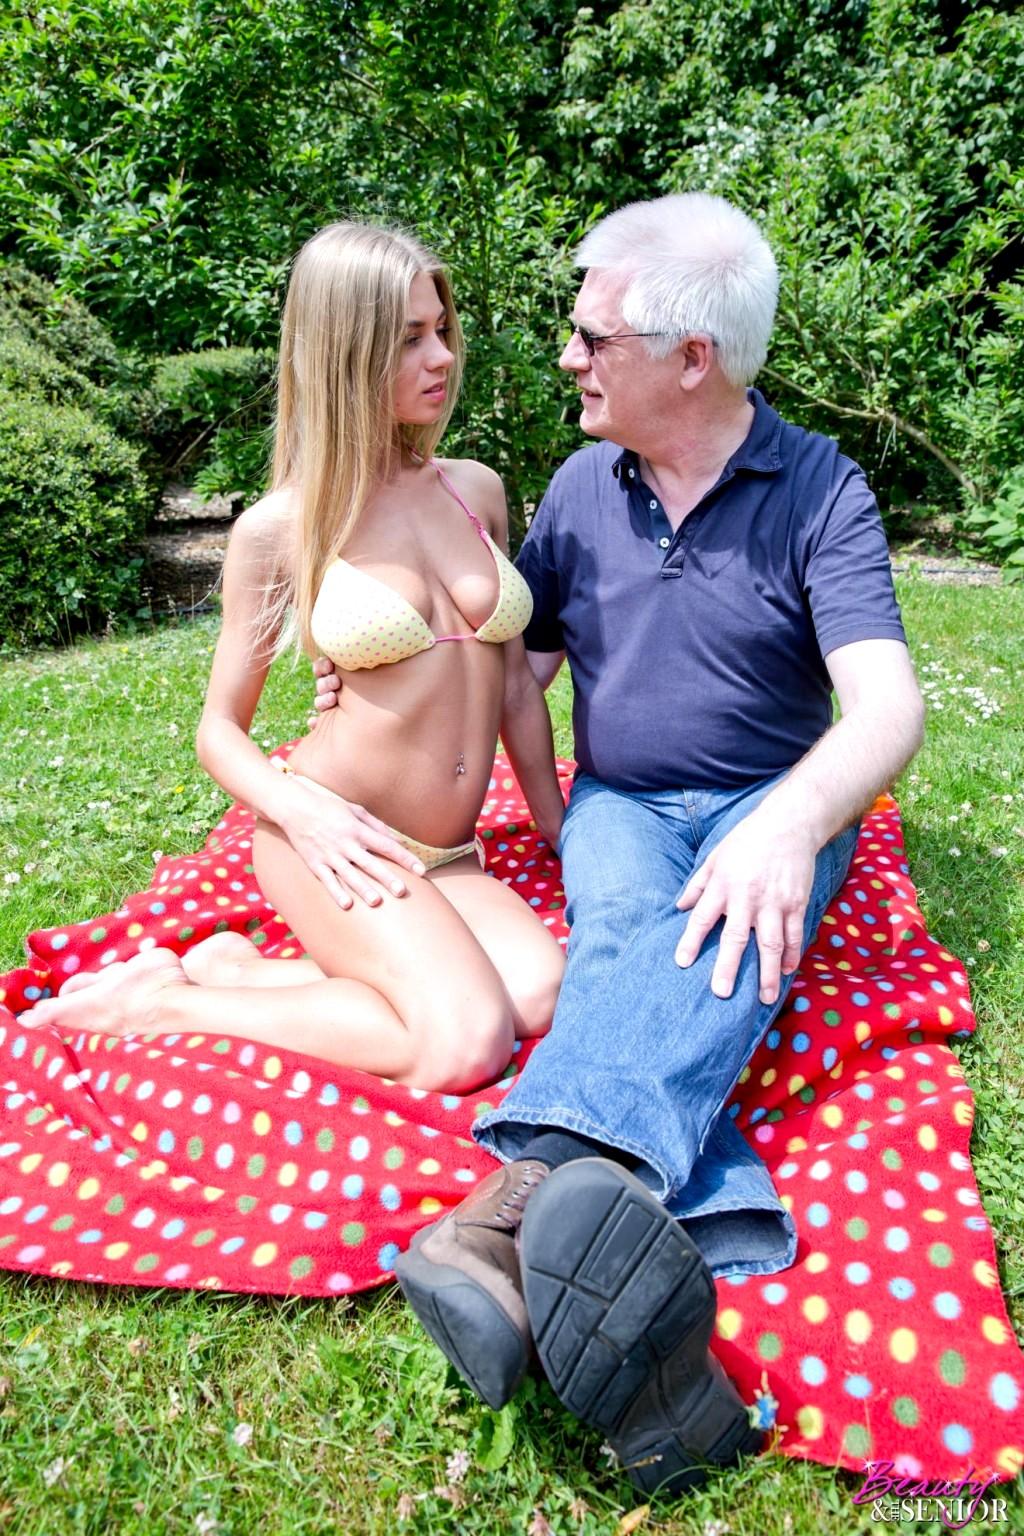 shannon elizabeth naked sex